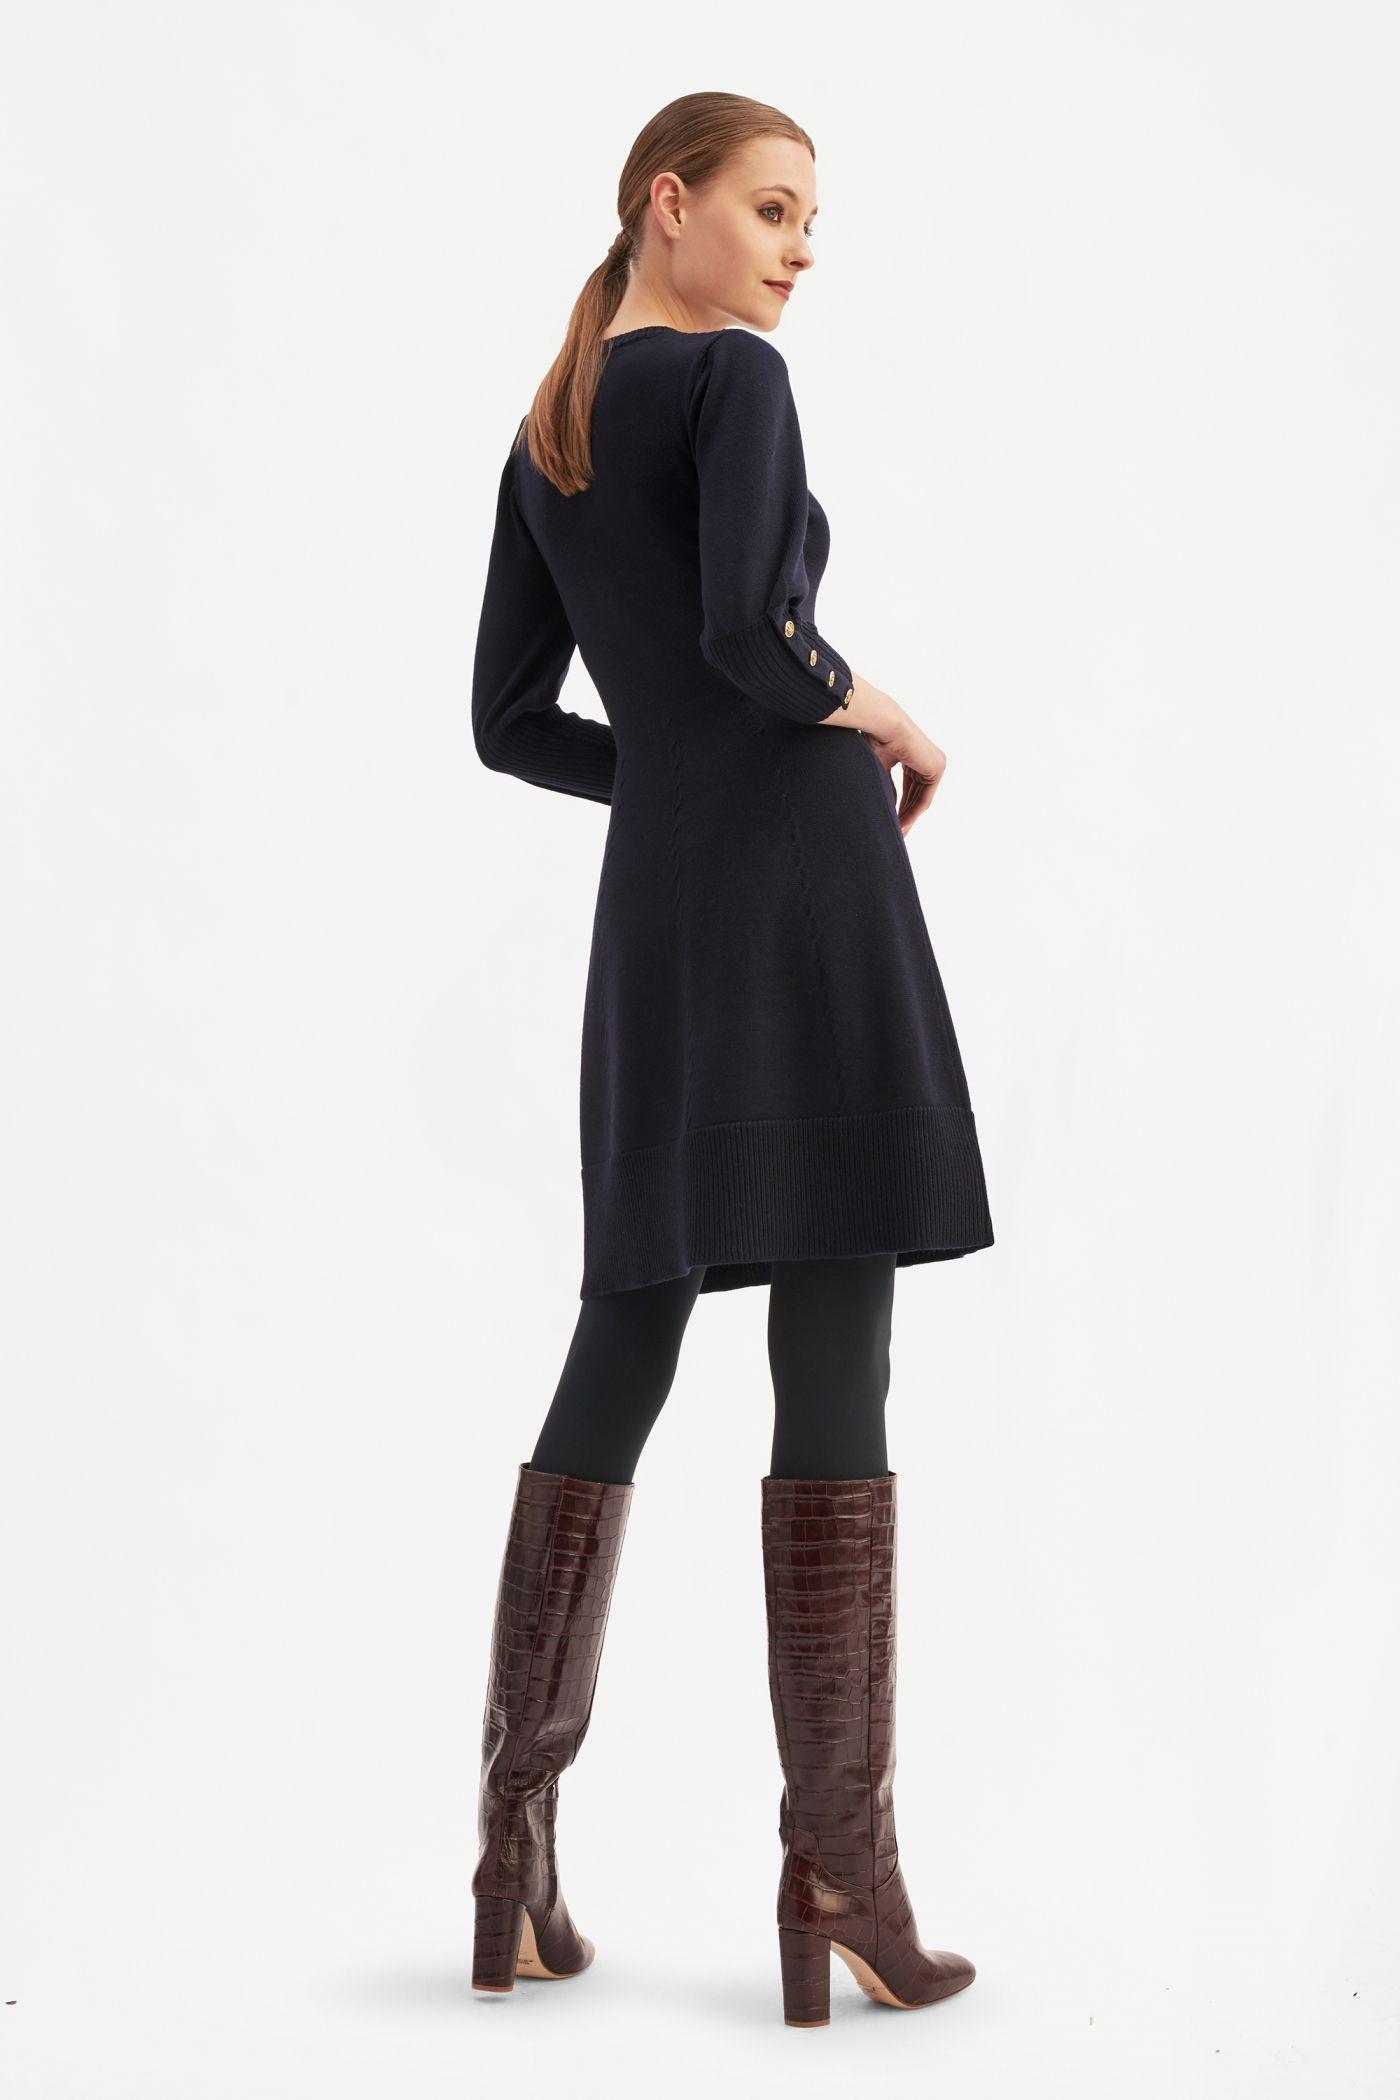 METEORE DRESS 1270 2